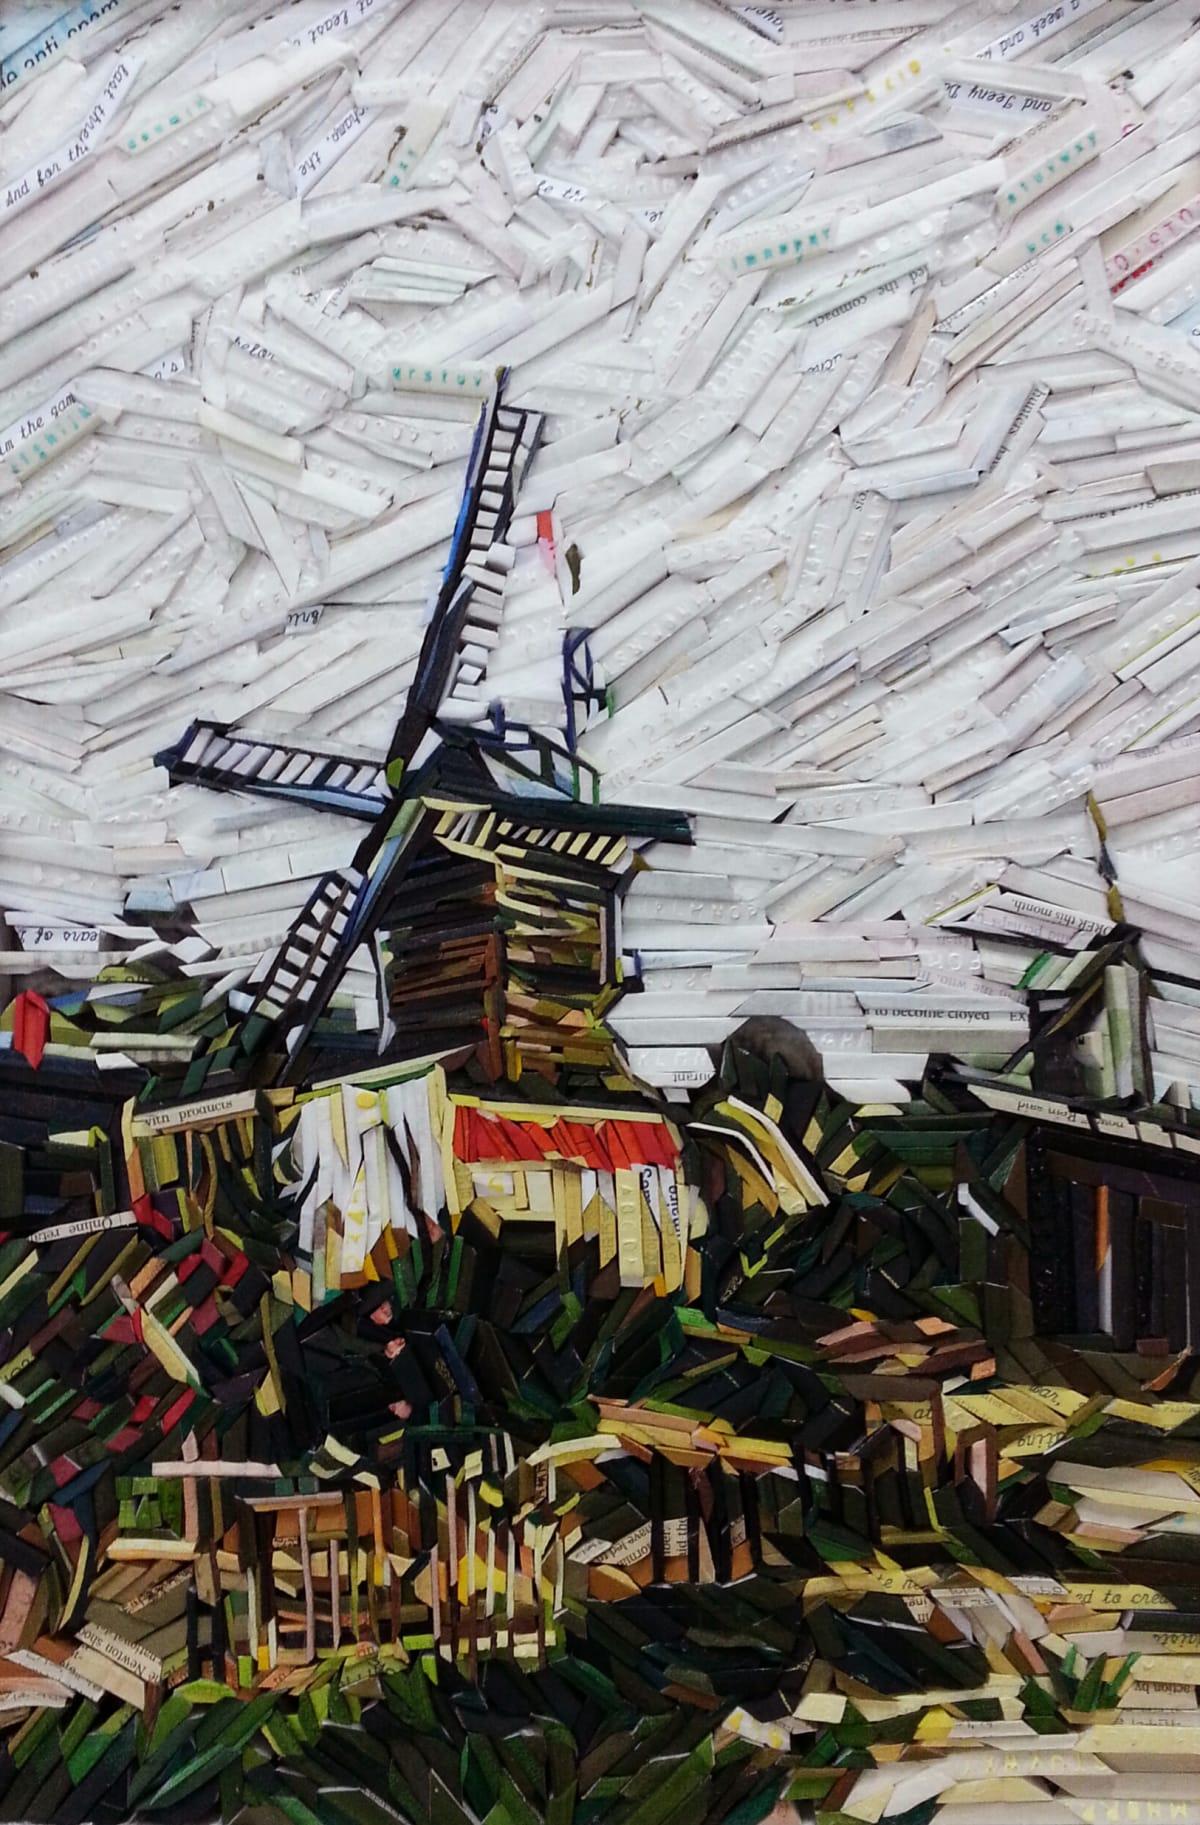 Kyu-Hak Lee, Monument - Le Moulin de Blute Fin Mill, 2015